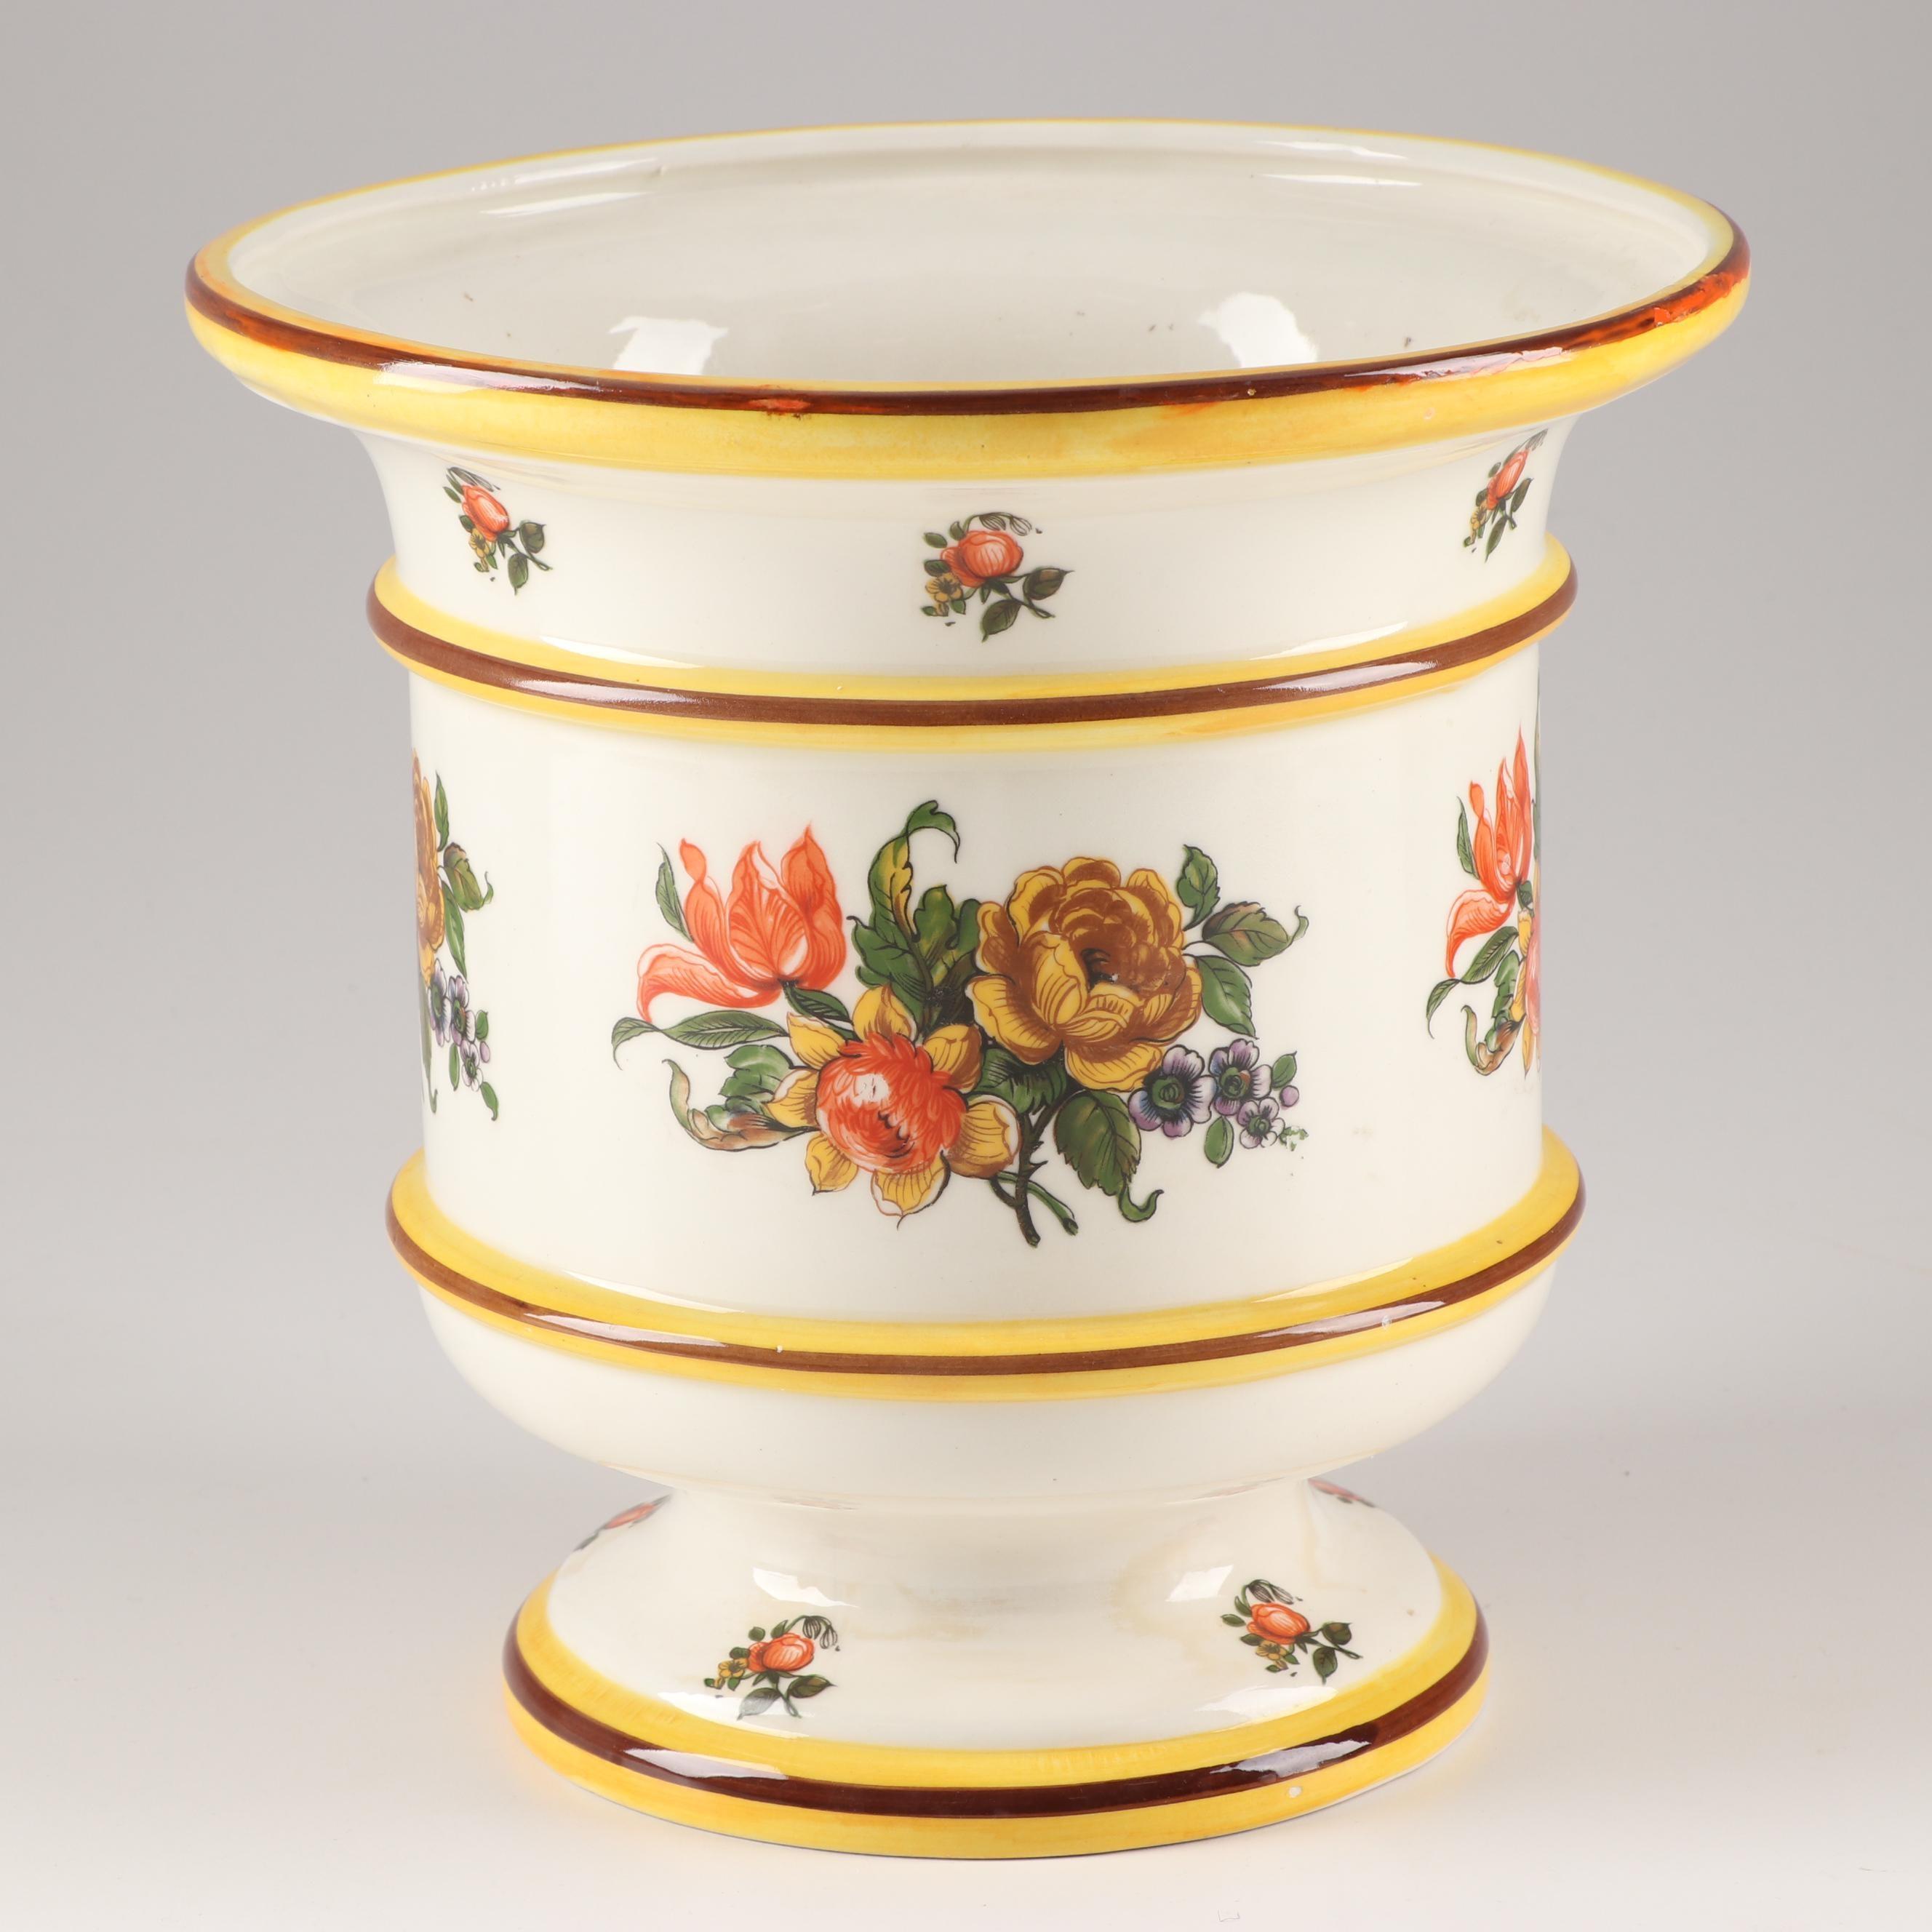 Hand-Painted Italian Ceramic Jardiniere